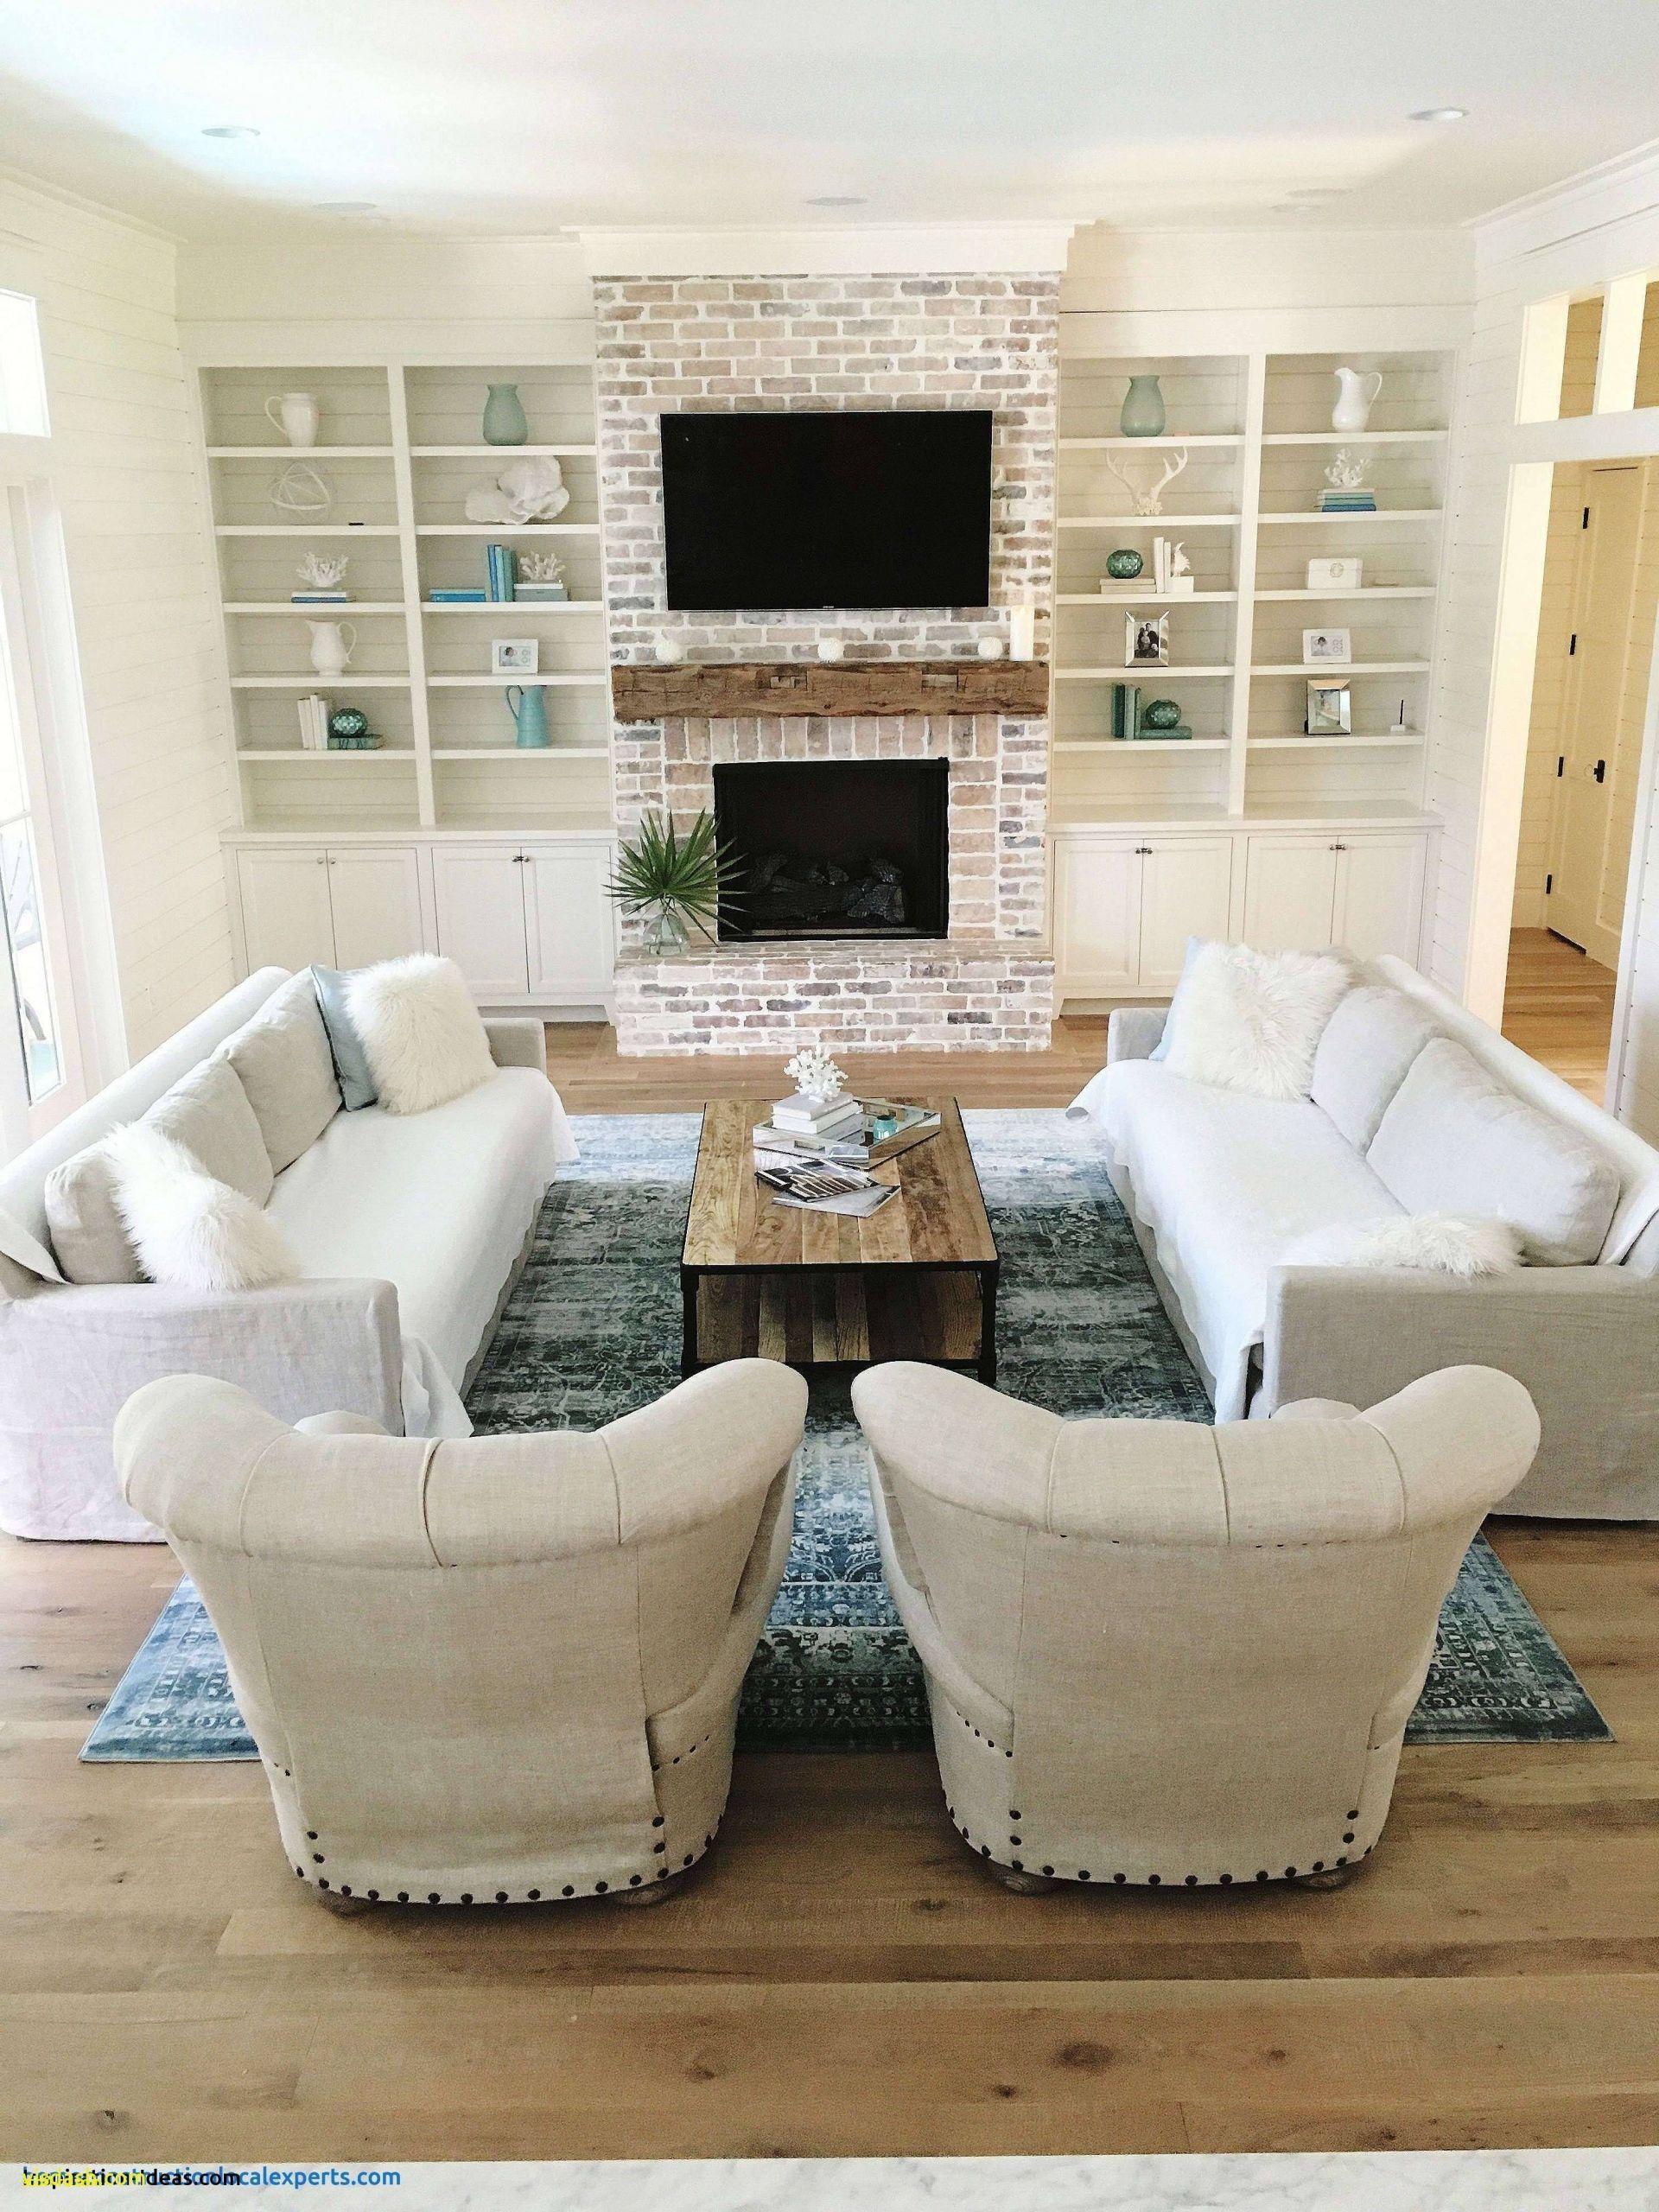 home interior design small spaces pictures modern living room furniture new gunstige sofa macys furniture 0d design ideas stylish design furniture unique